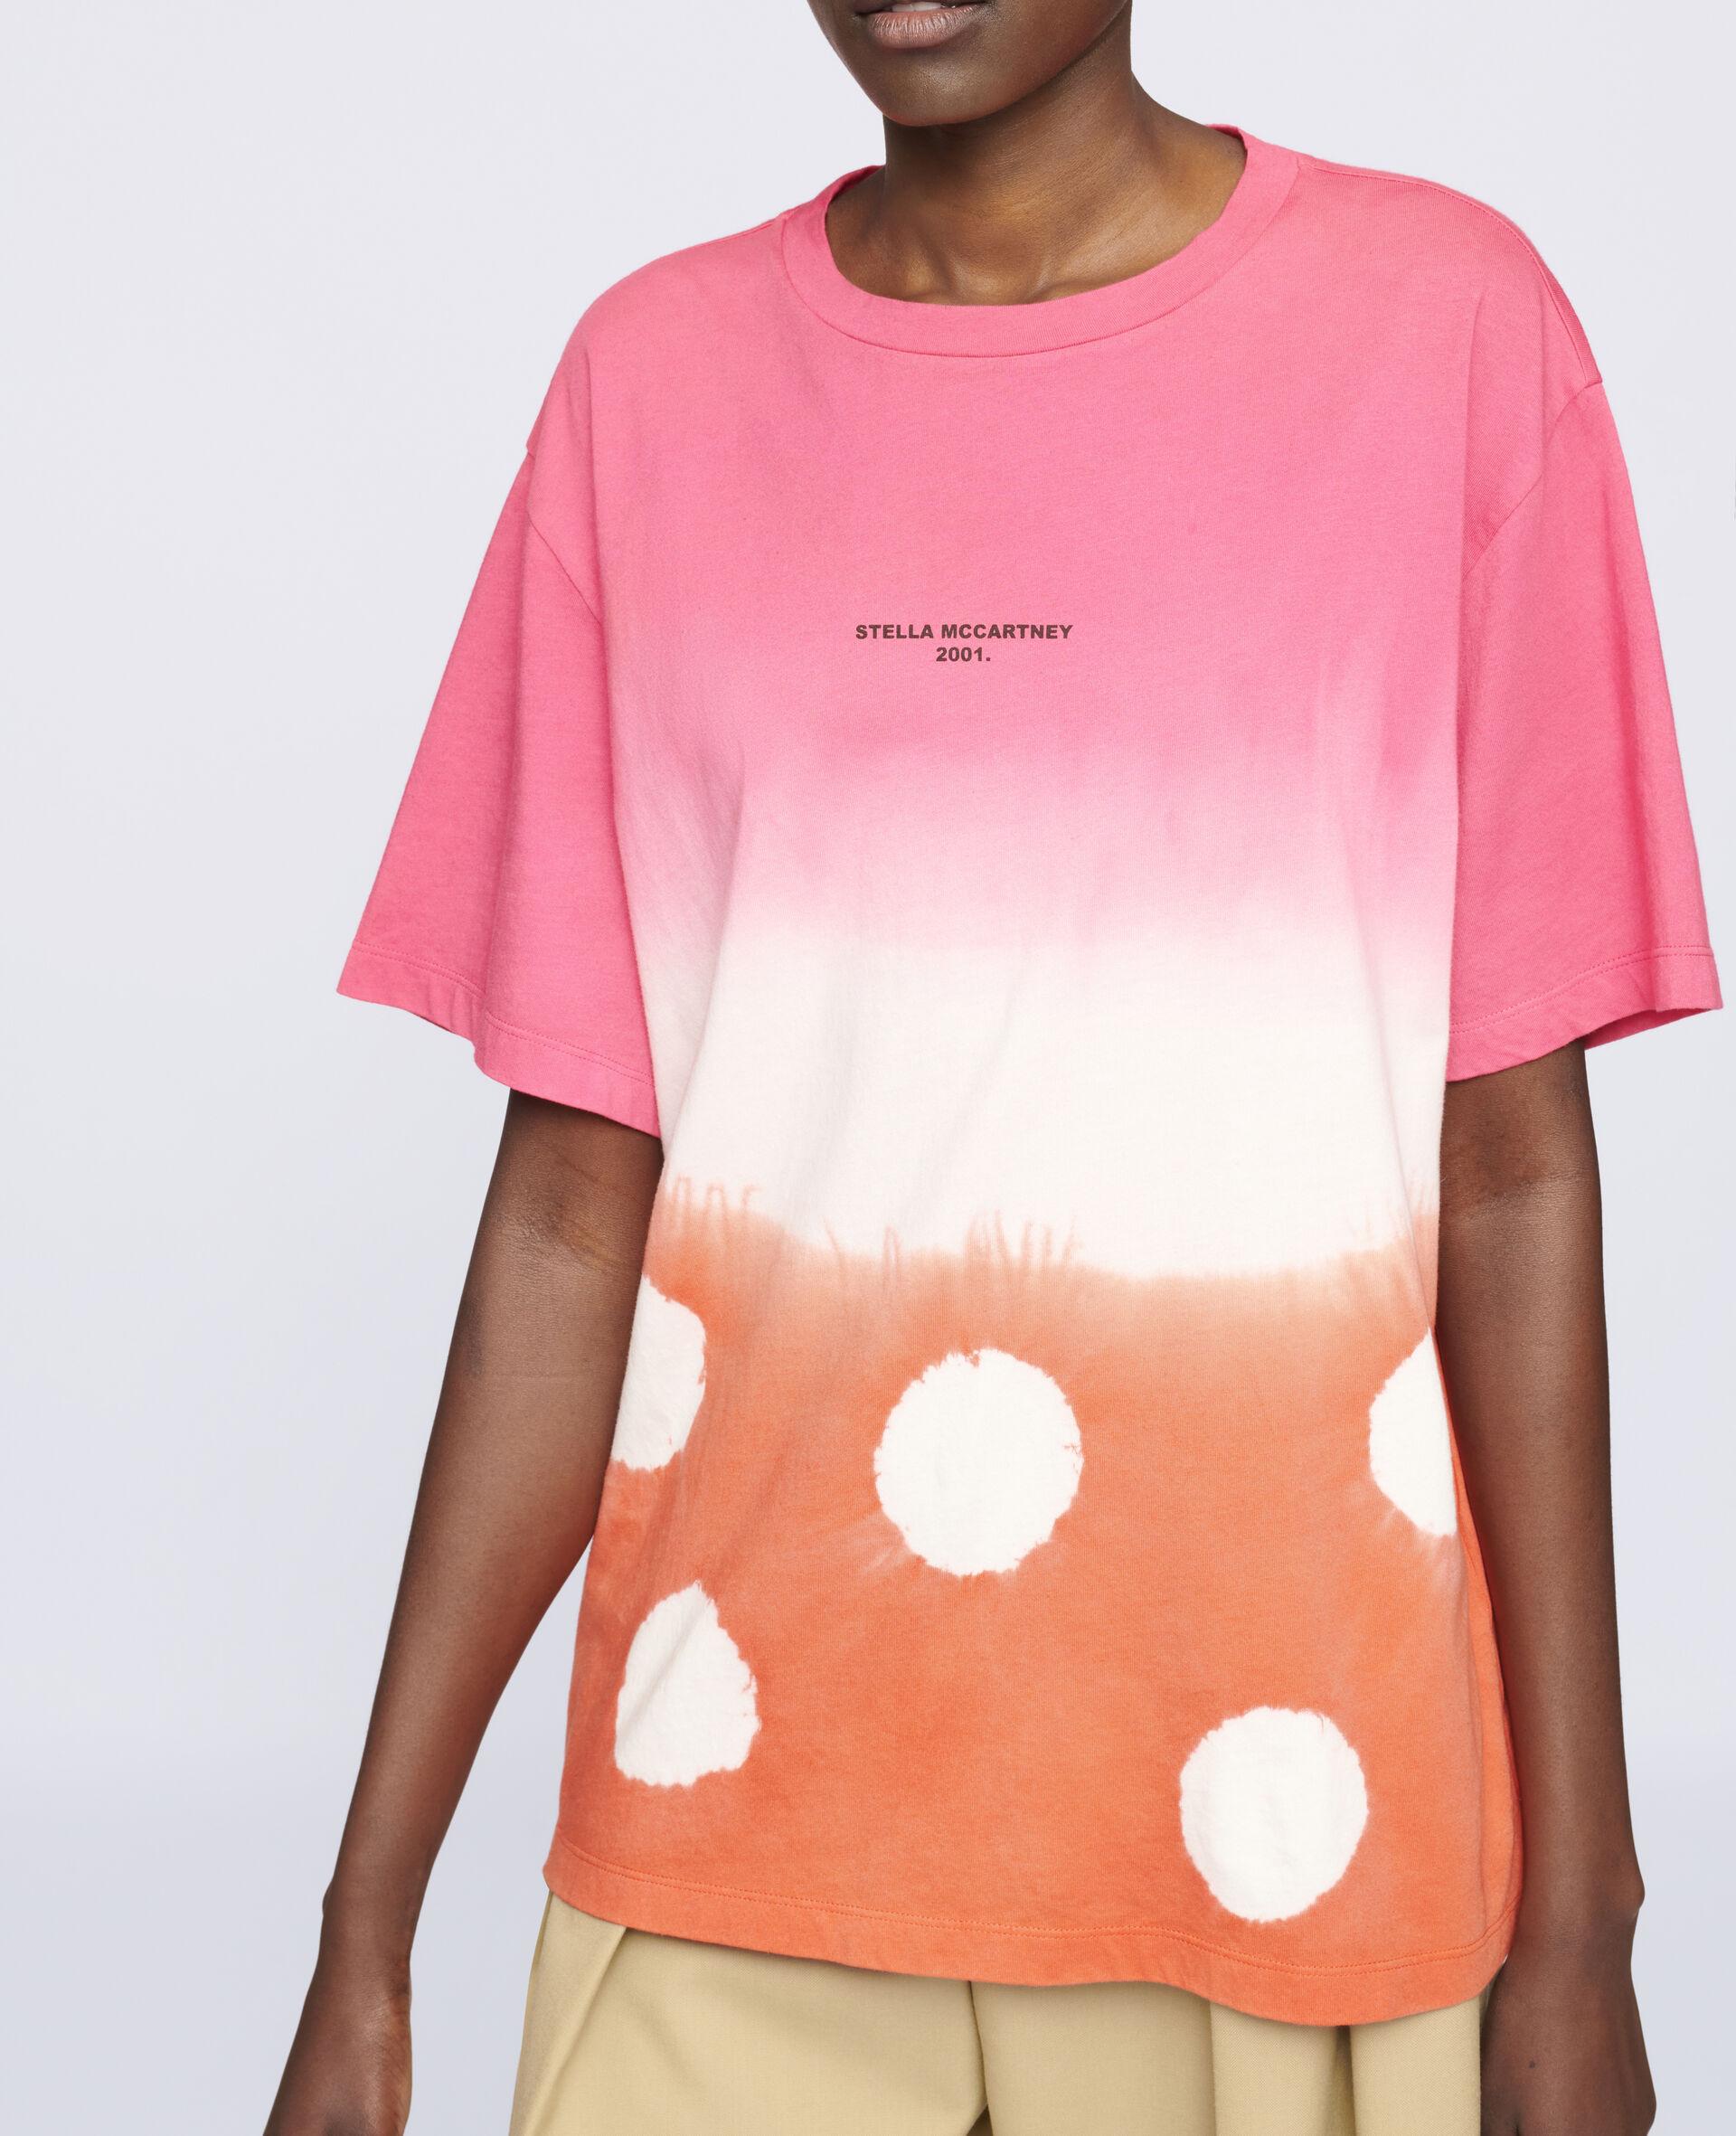 Stella McCartney 2001.' 扎染 T 恤-Multicolored-large image number 3